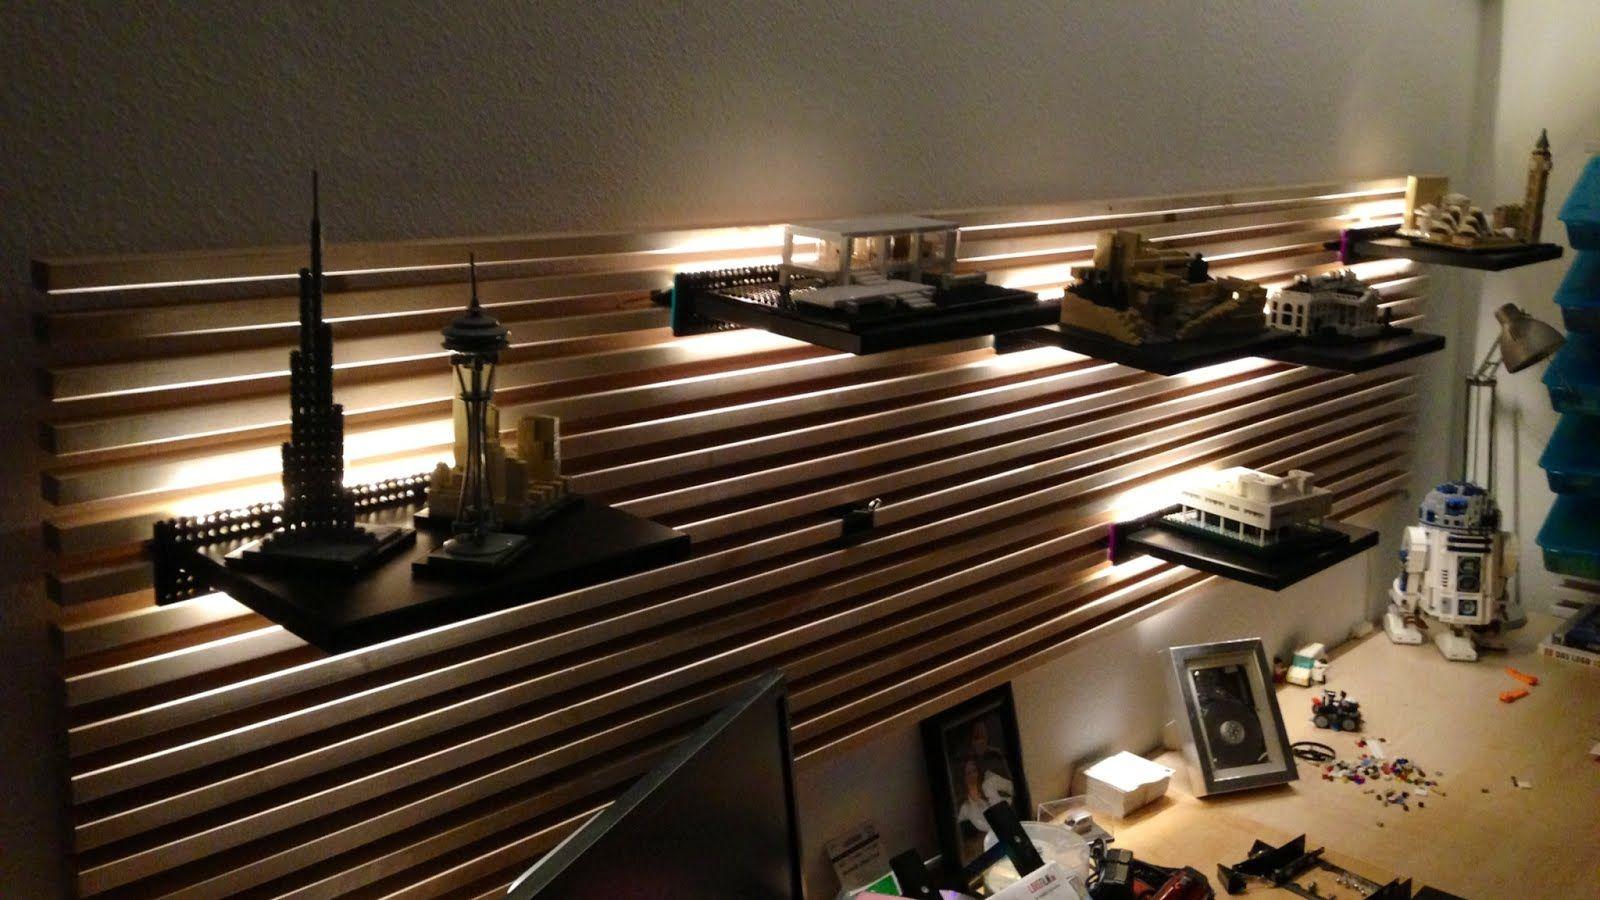 Indirect Lighting For Mandal Headboard Using Lego With Images Indirect Lighting Ikea